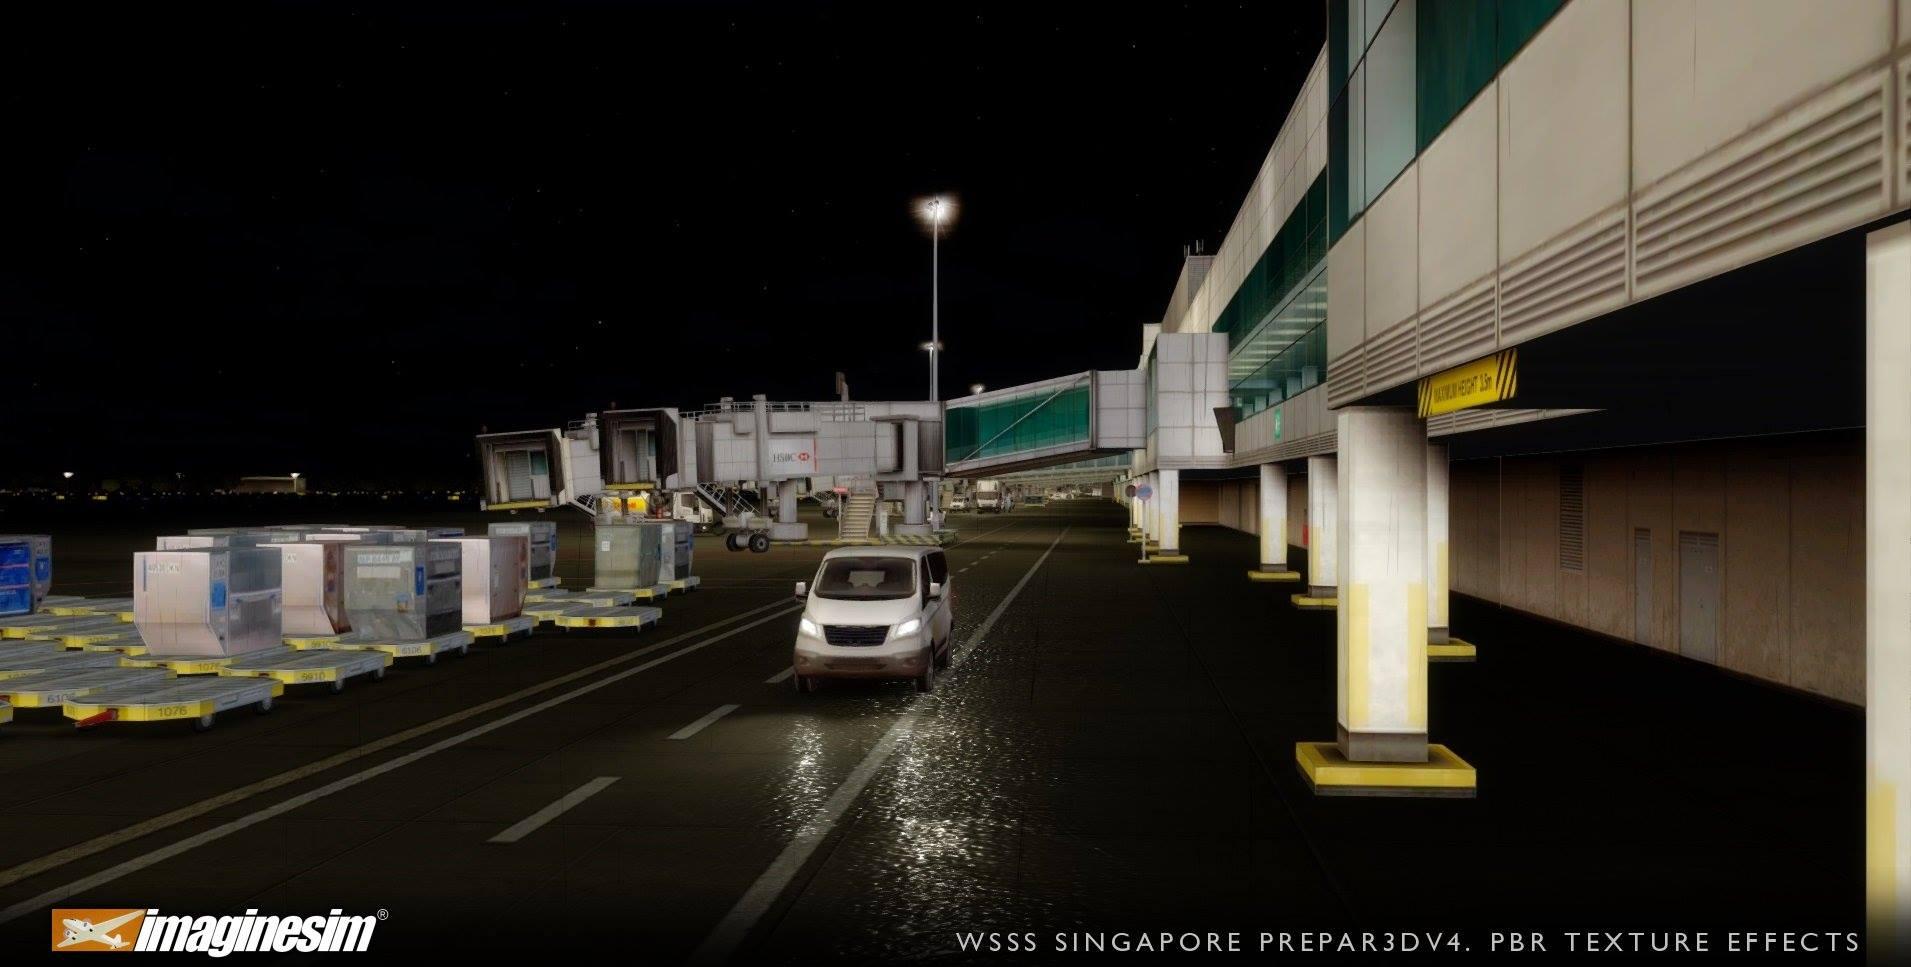 Singapore P3dv4 Pbr (2)